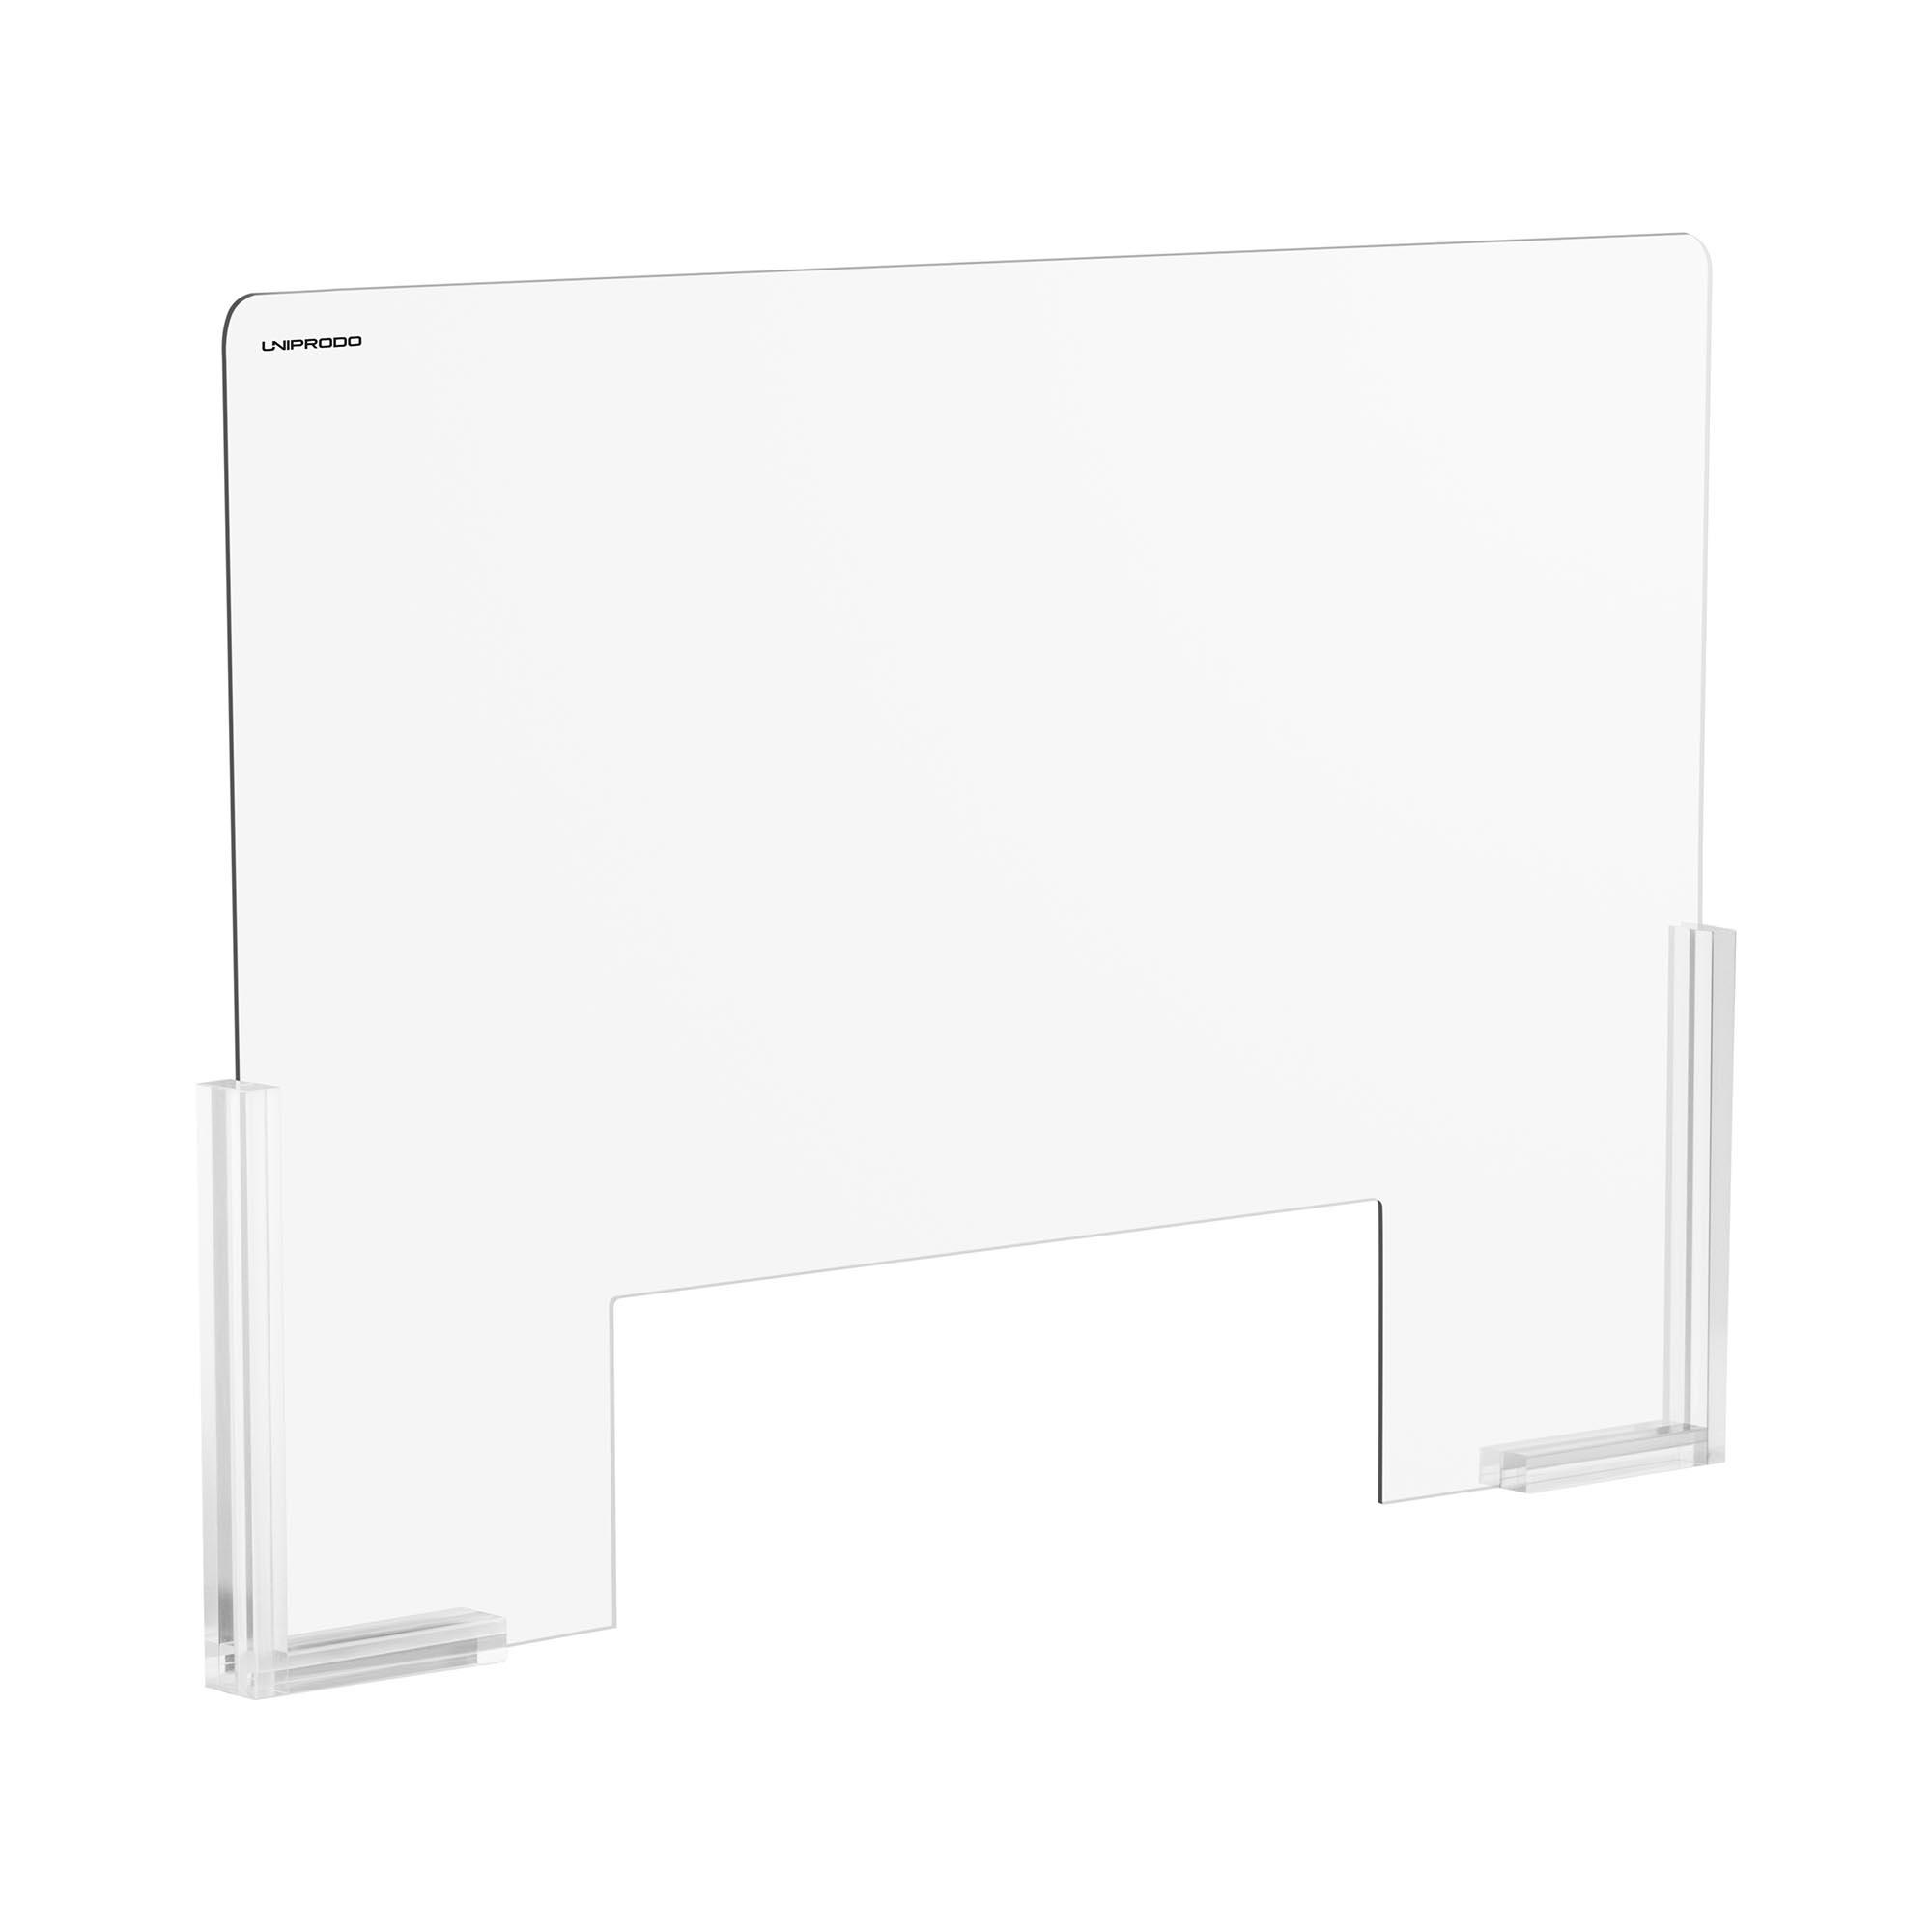 Uniprodo Spuckschutz - 95 x 65 cm - Acrylglas - Durchreiche 38 x 25 cm UNI-PPG03